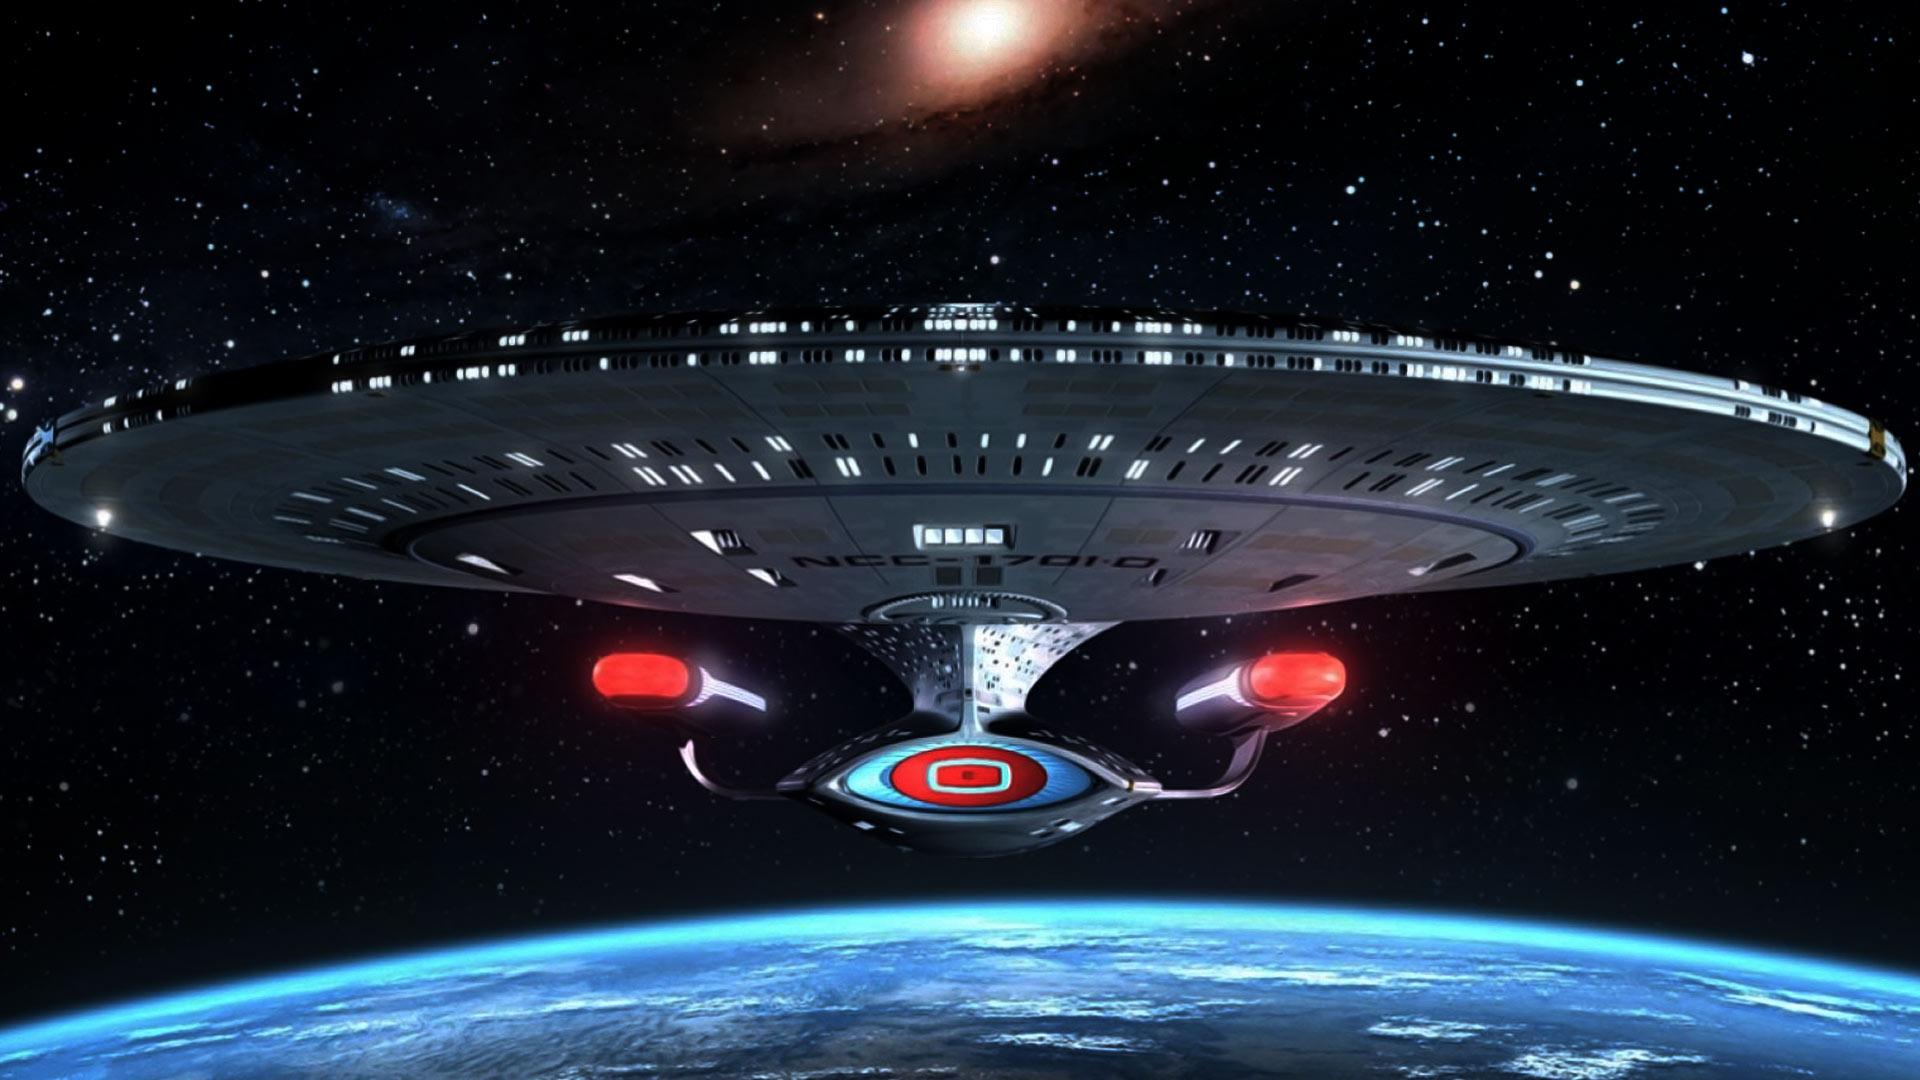 Sci Fi Star Trek Wallpaper HD 1920x1080 ImageBankbiz 1920x1080